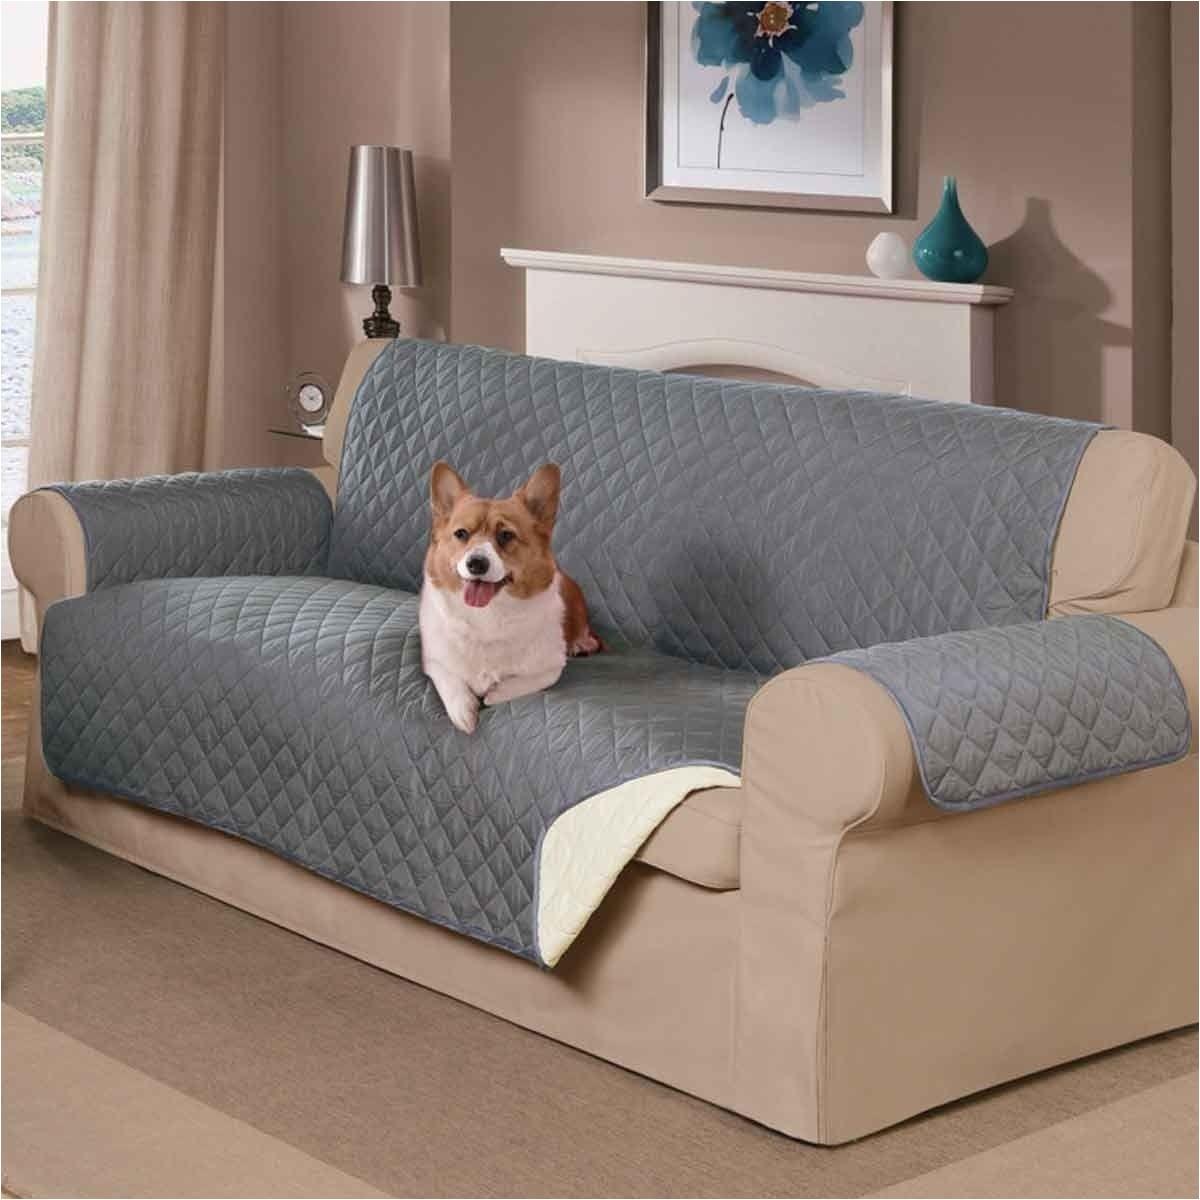 Reversible Pet Extra-long sofa Slipcover Mason Home Decor Reversible Pet sofa Cover Marleys Board